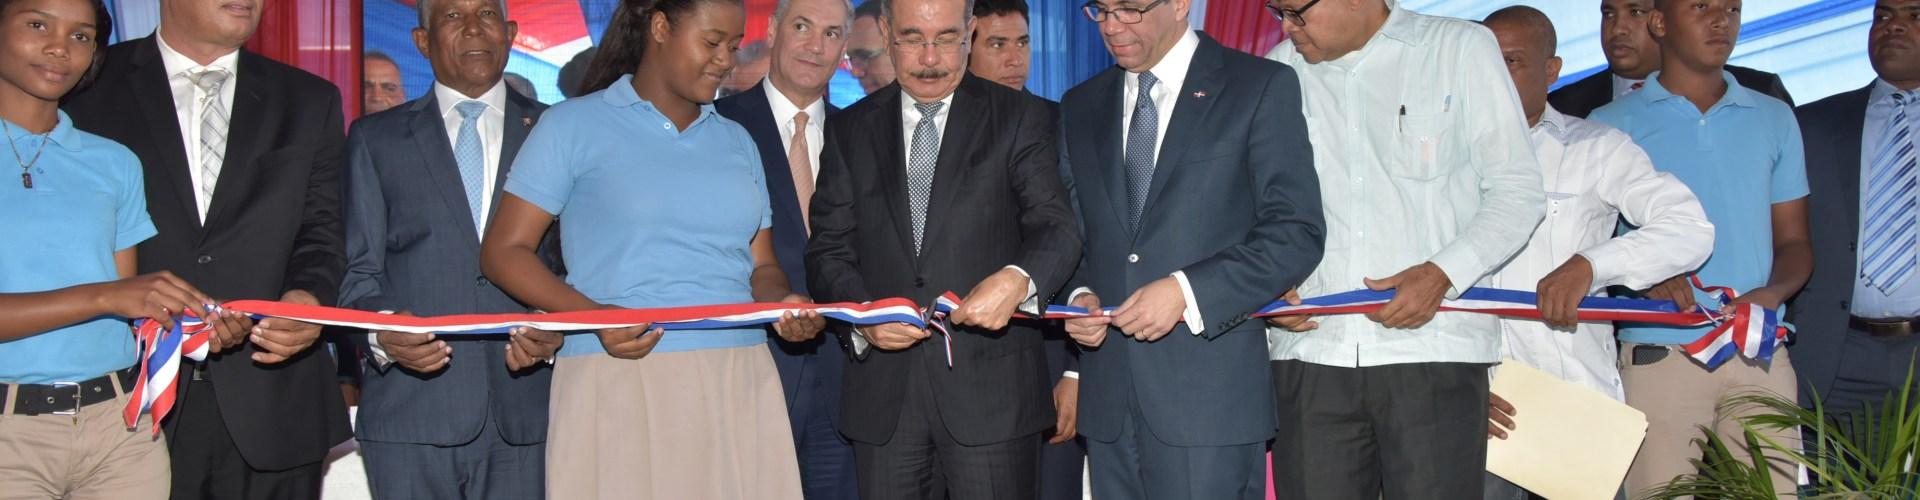 Medina inaugura escuela en municipio Tamayo